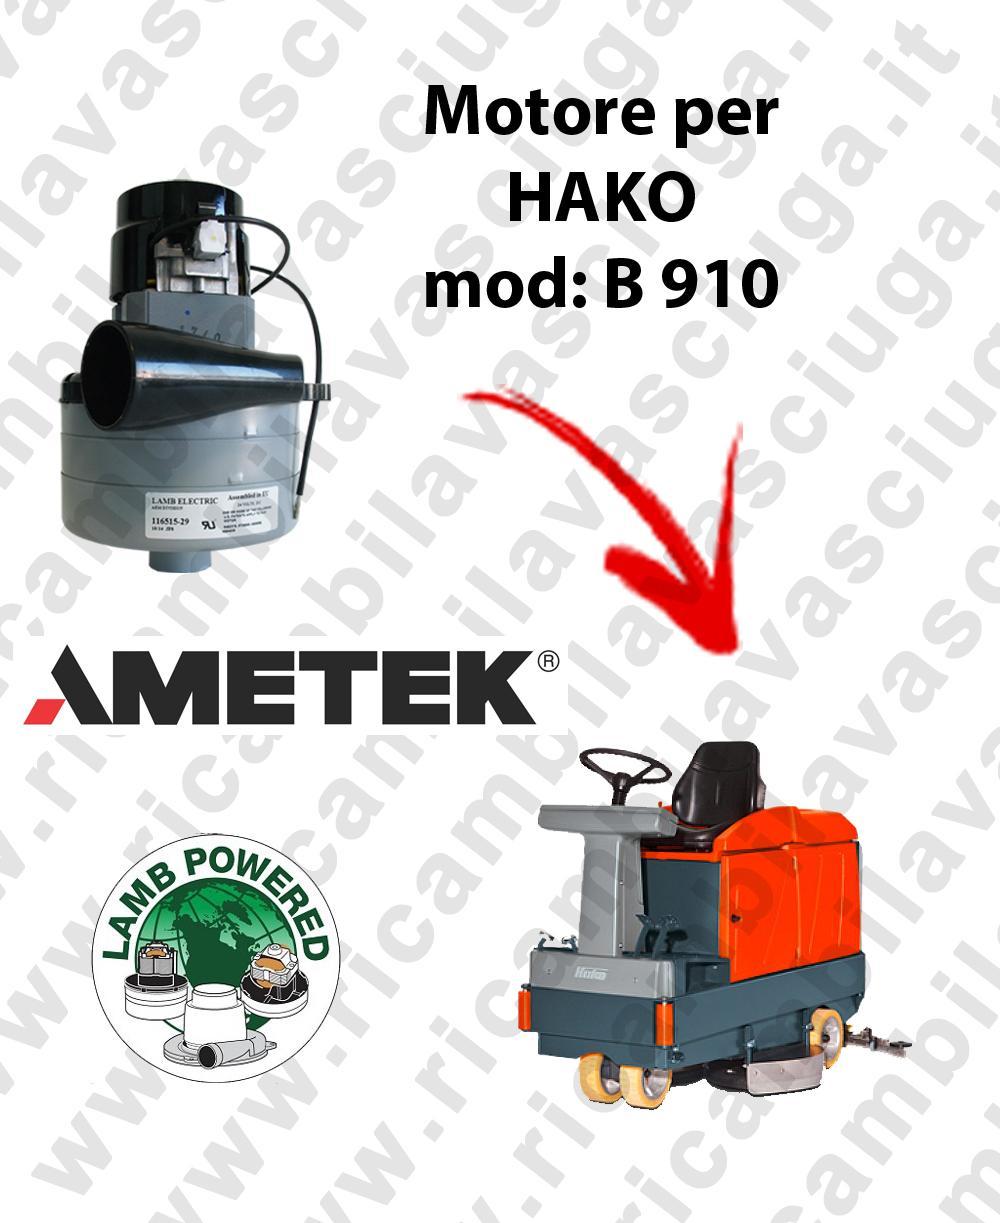 B 910 moteur LAMB AMETEK di aspiration pour autolaveuses HAKO